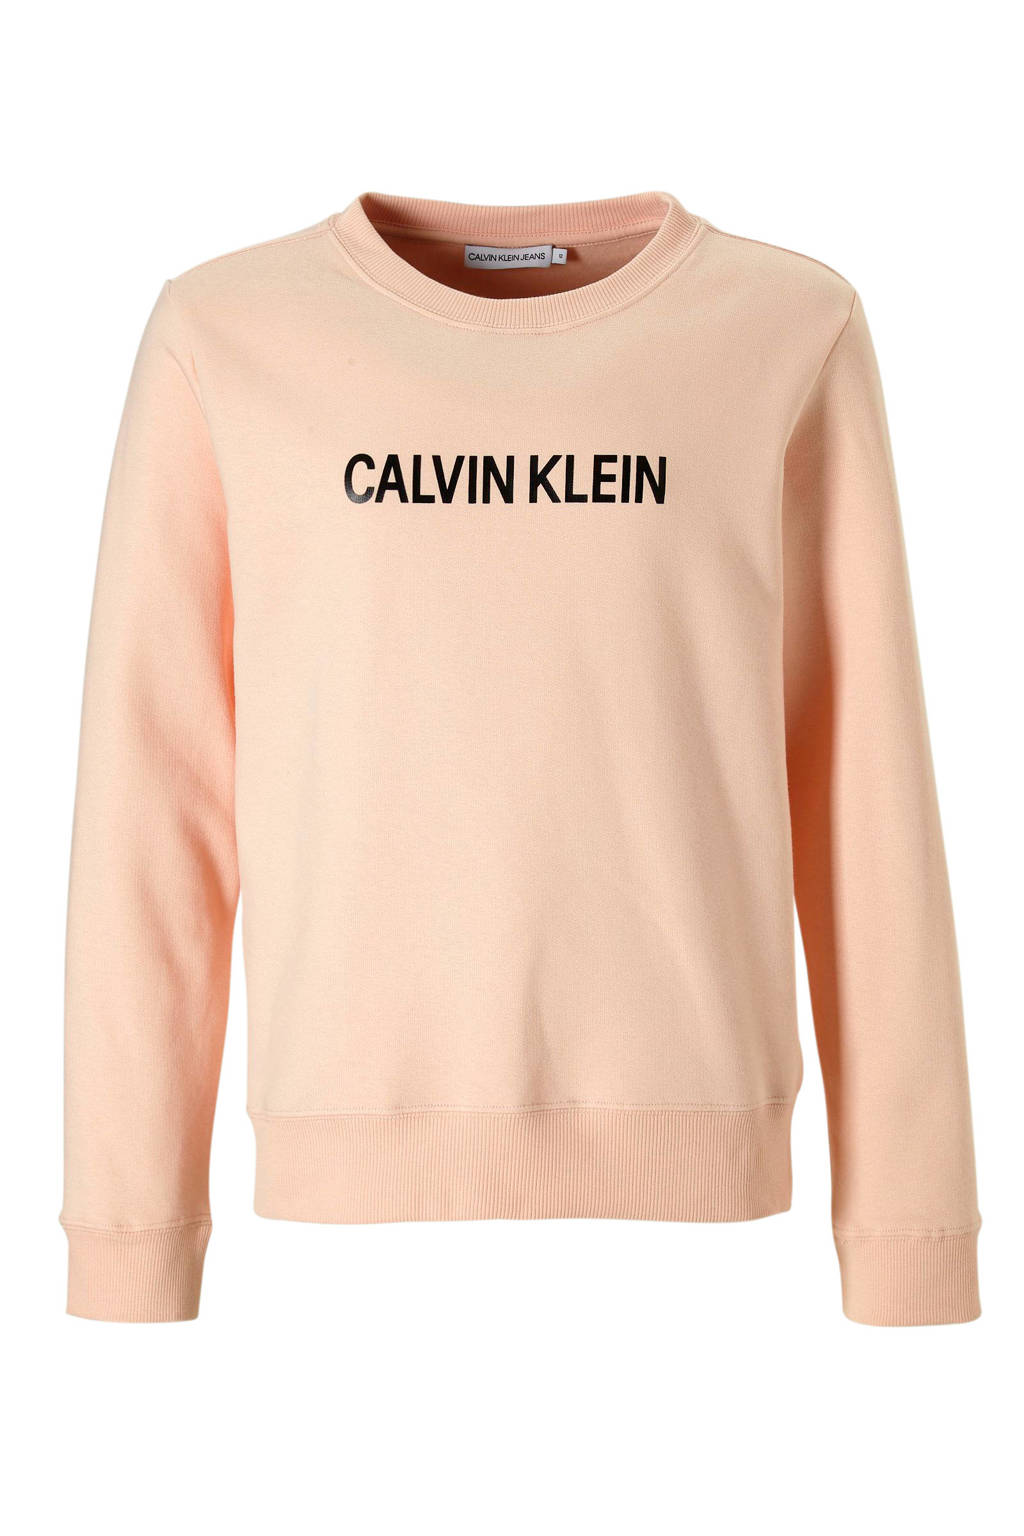 Calvin Klein Jeans sweater met logo roze, Lichtroze/zwart